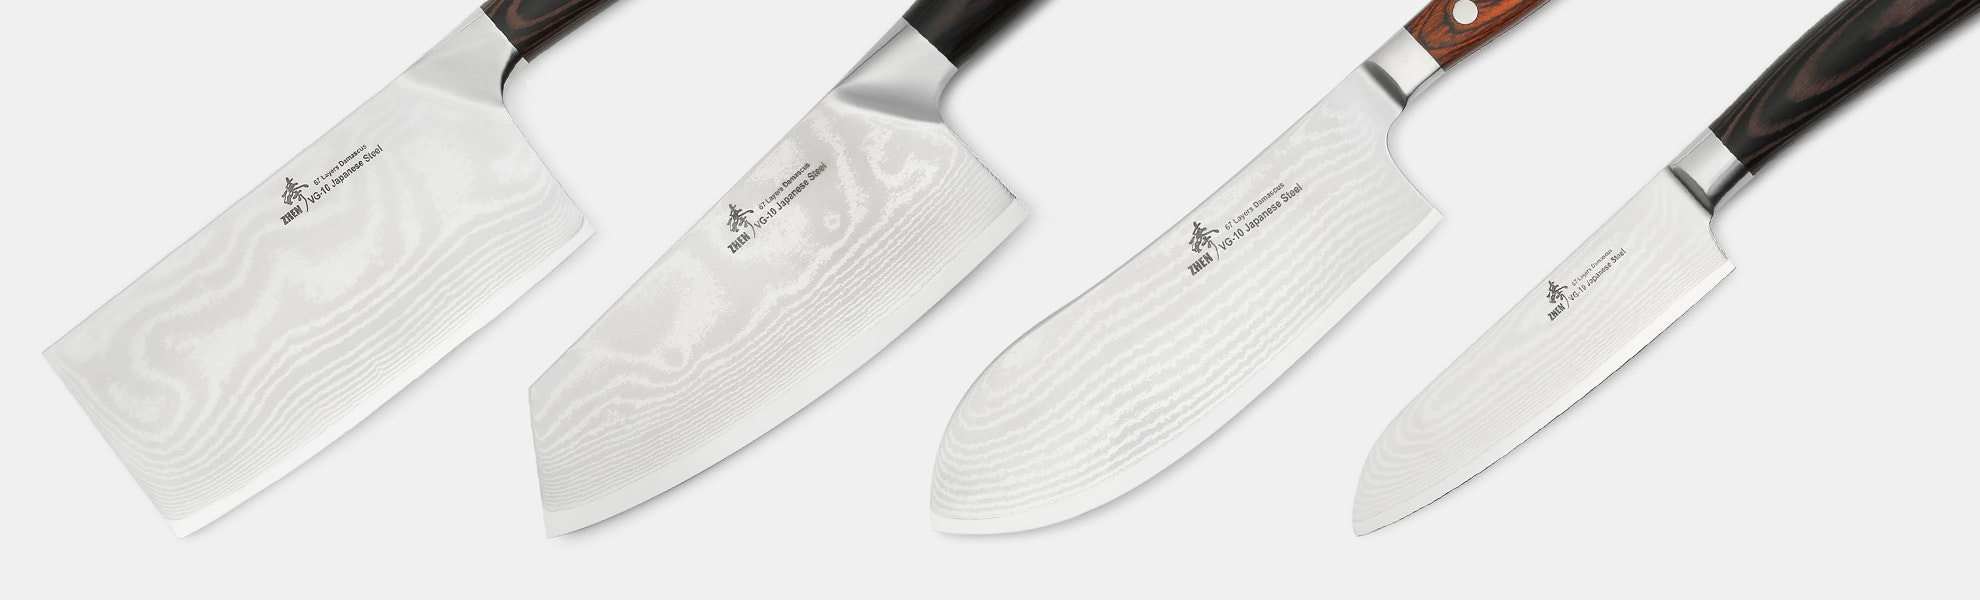 Zhen VG-10 Damascus Kitchen Knives